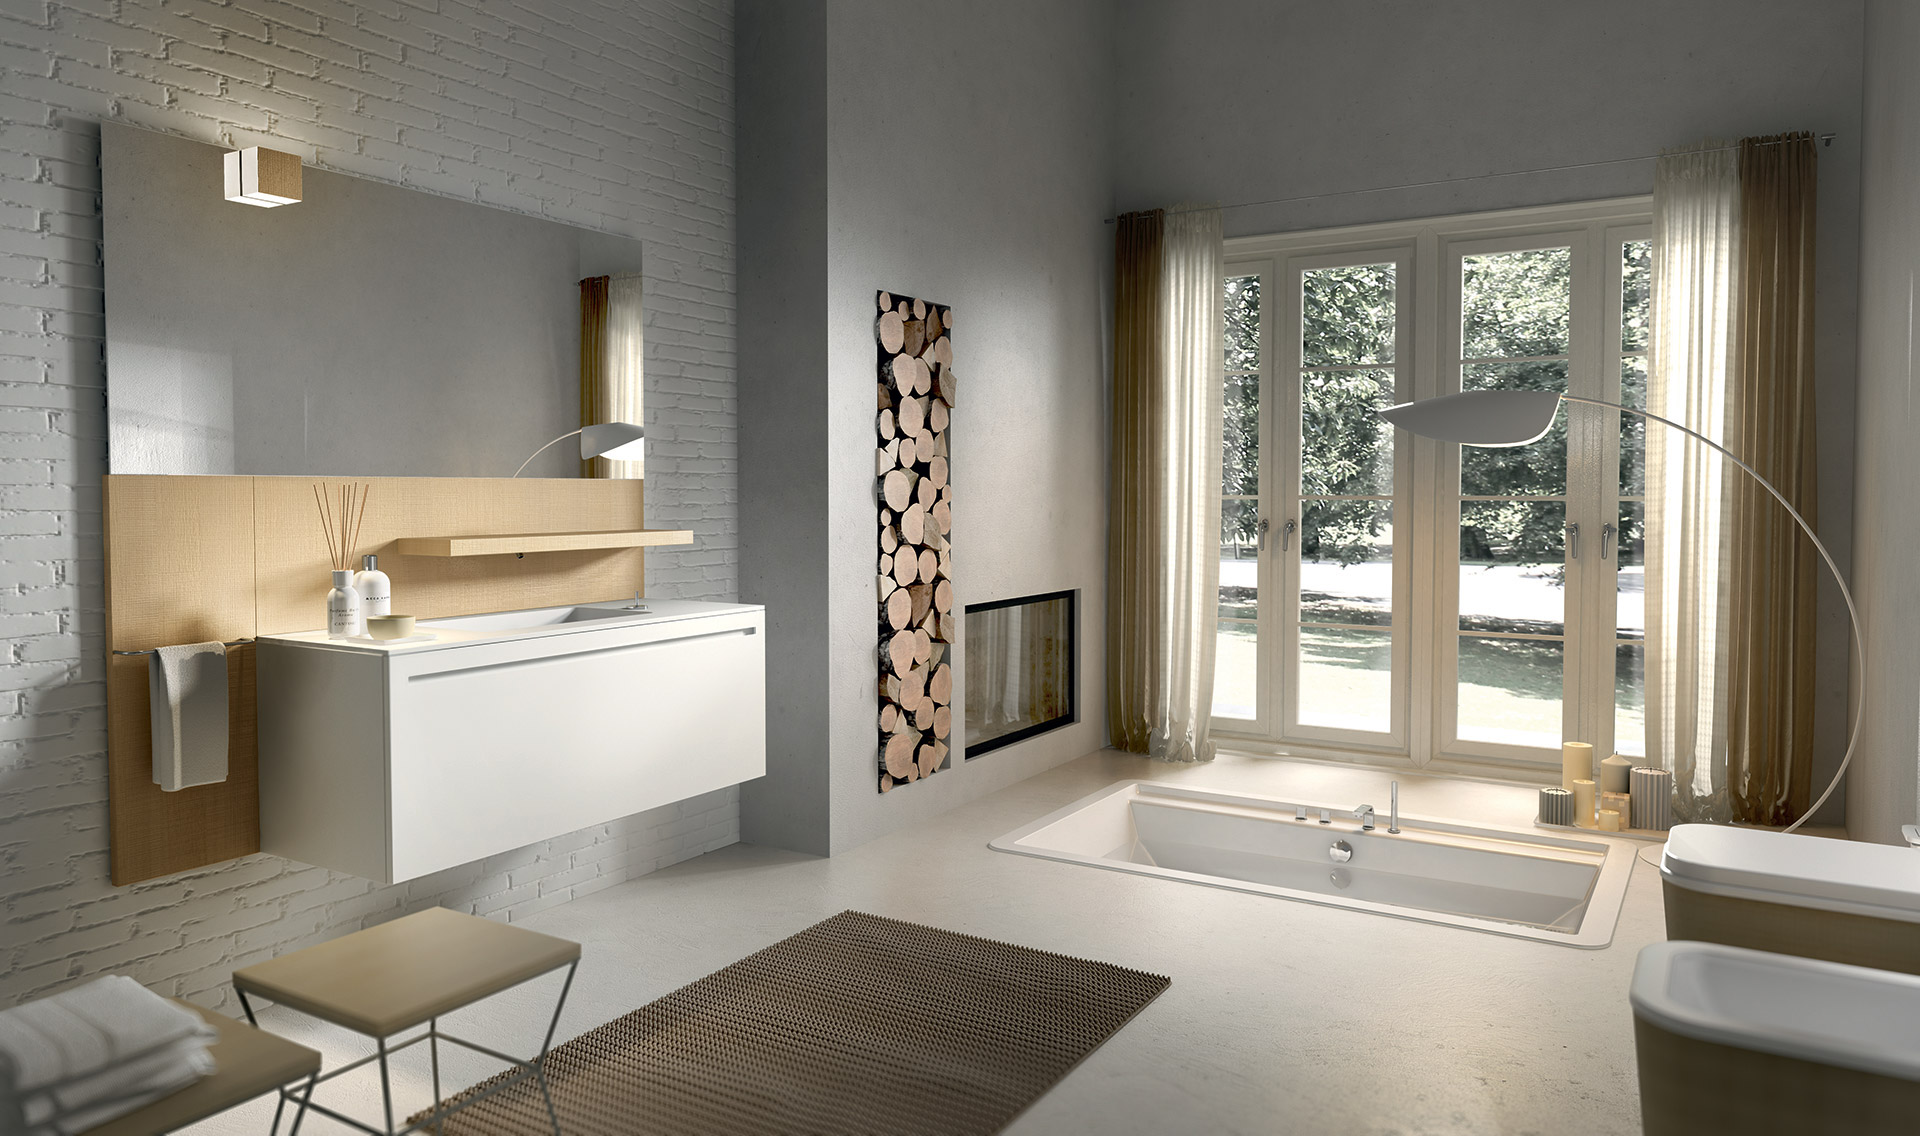 Colonne Salle De Bain Bambou Cdiscount ~ ker aura concept cuisine salle de bain spa